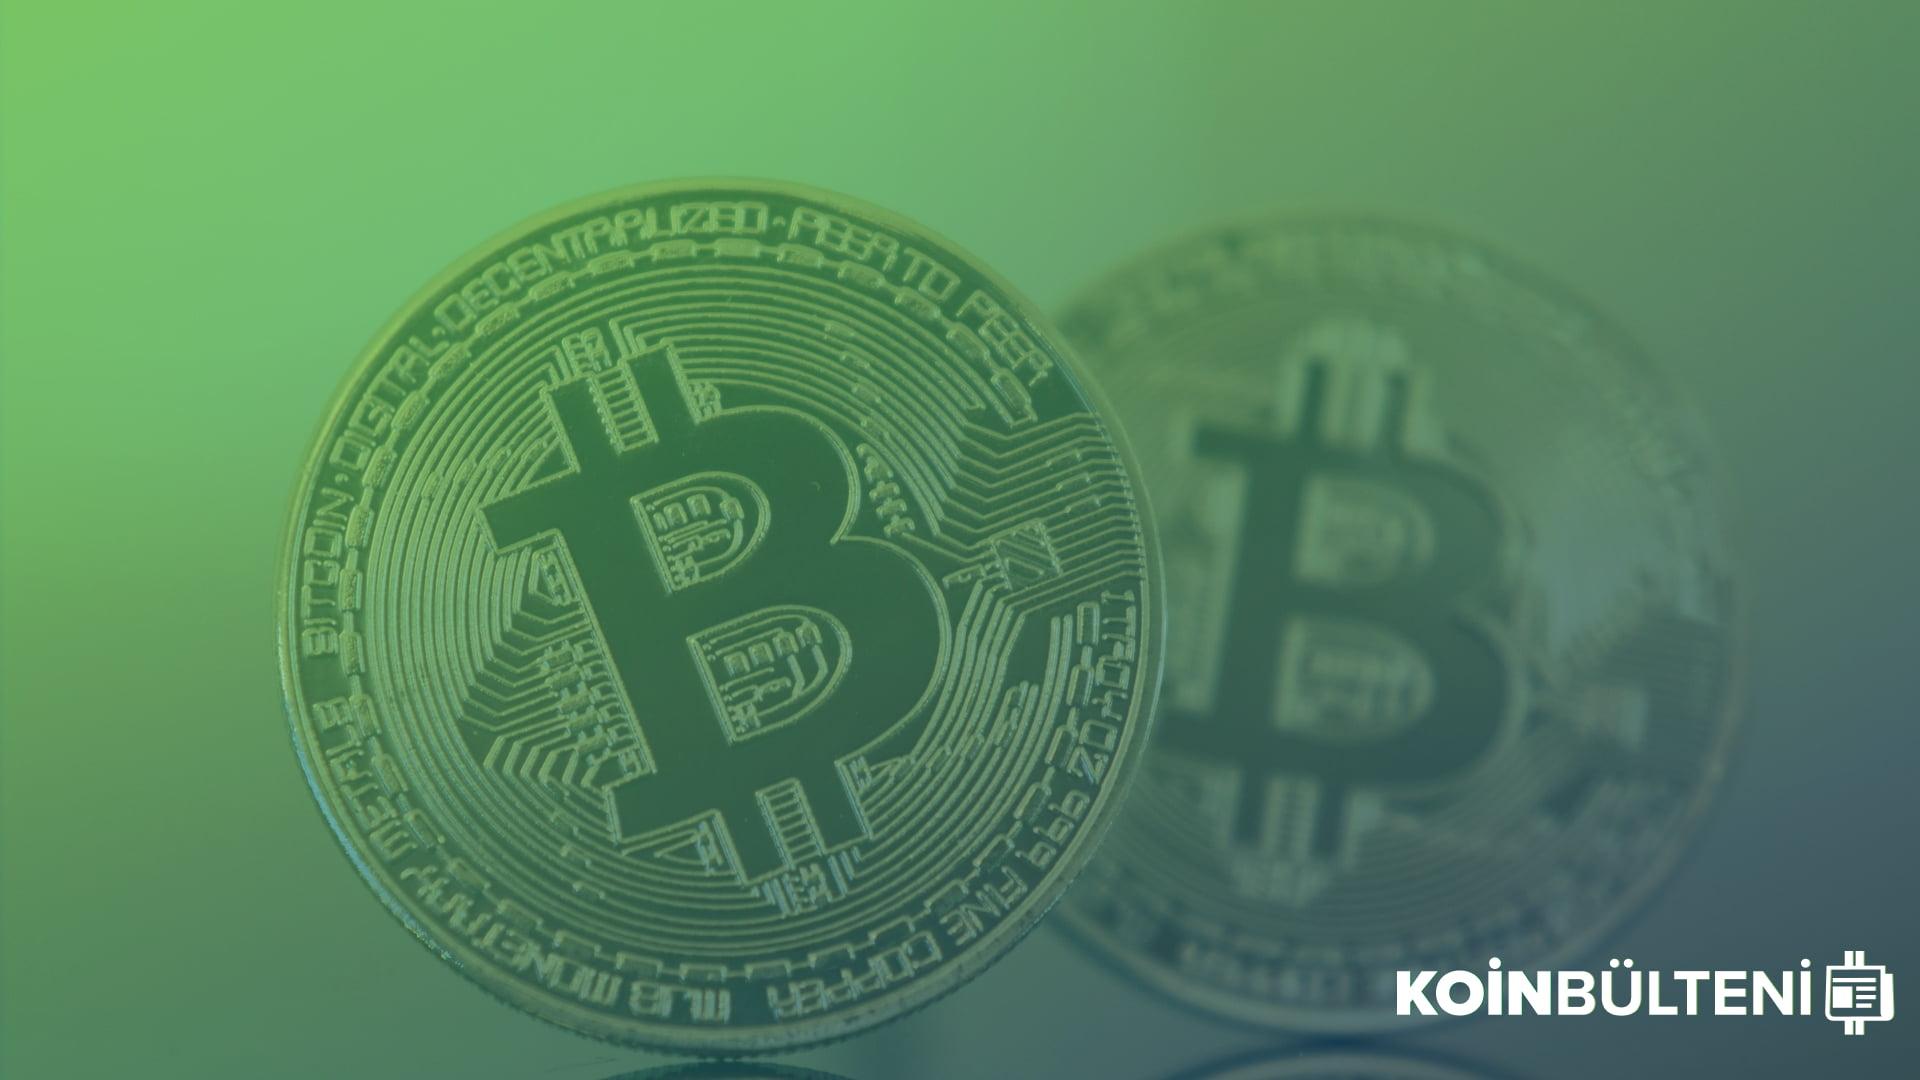 Larry-cermak-bitcoin-benimsenme